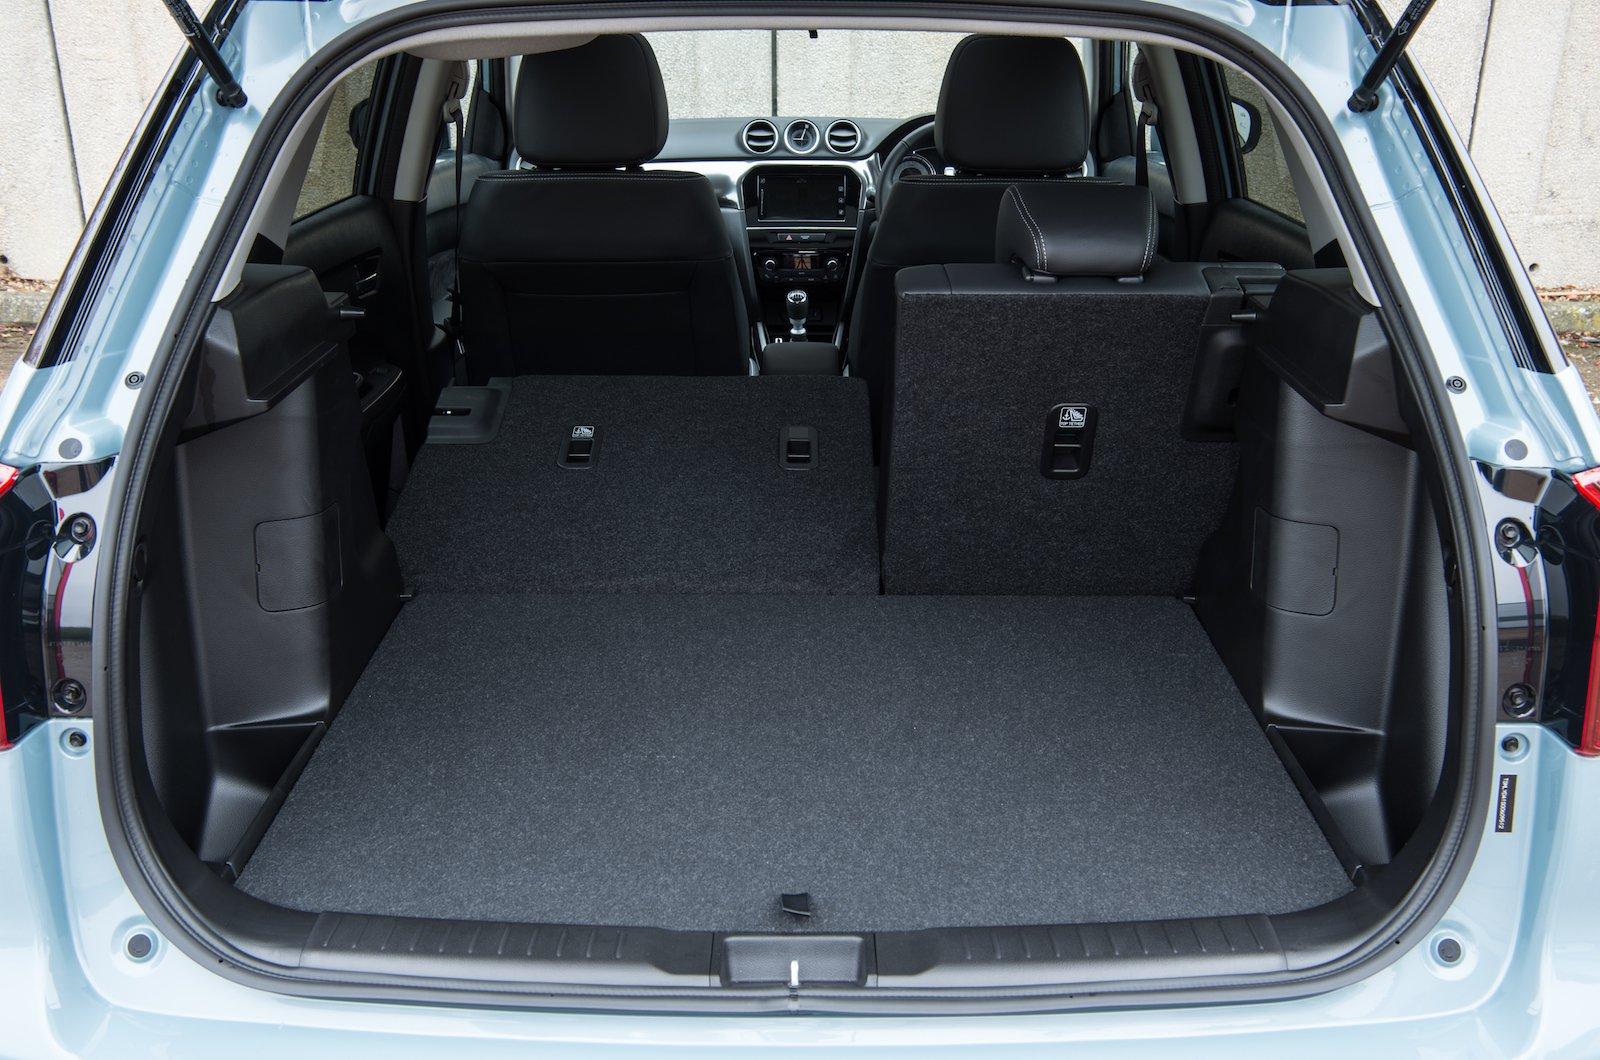 Suzuki Vitara boot